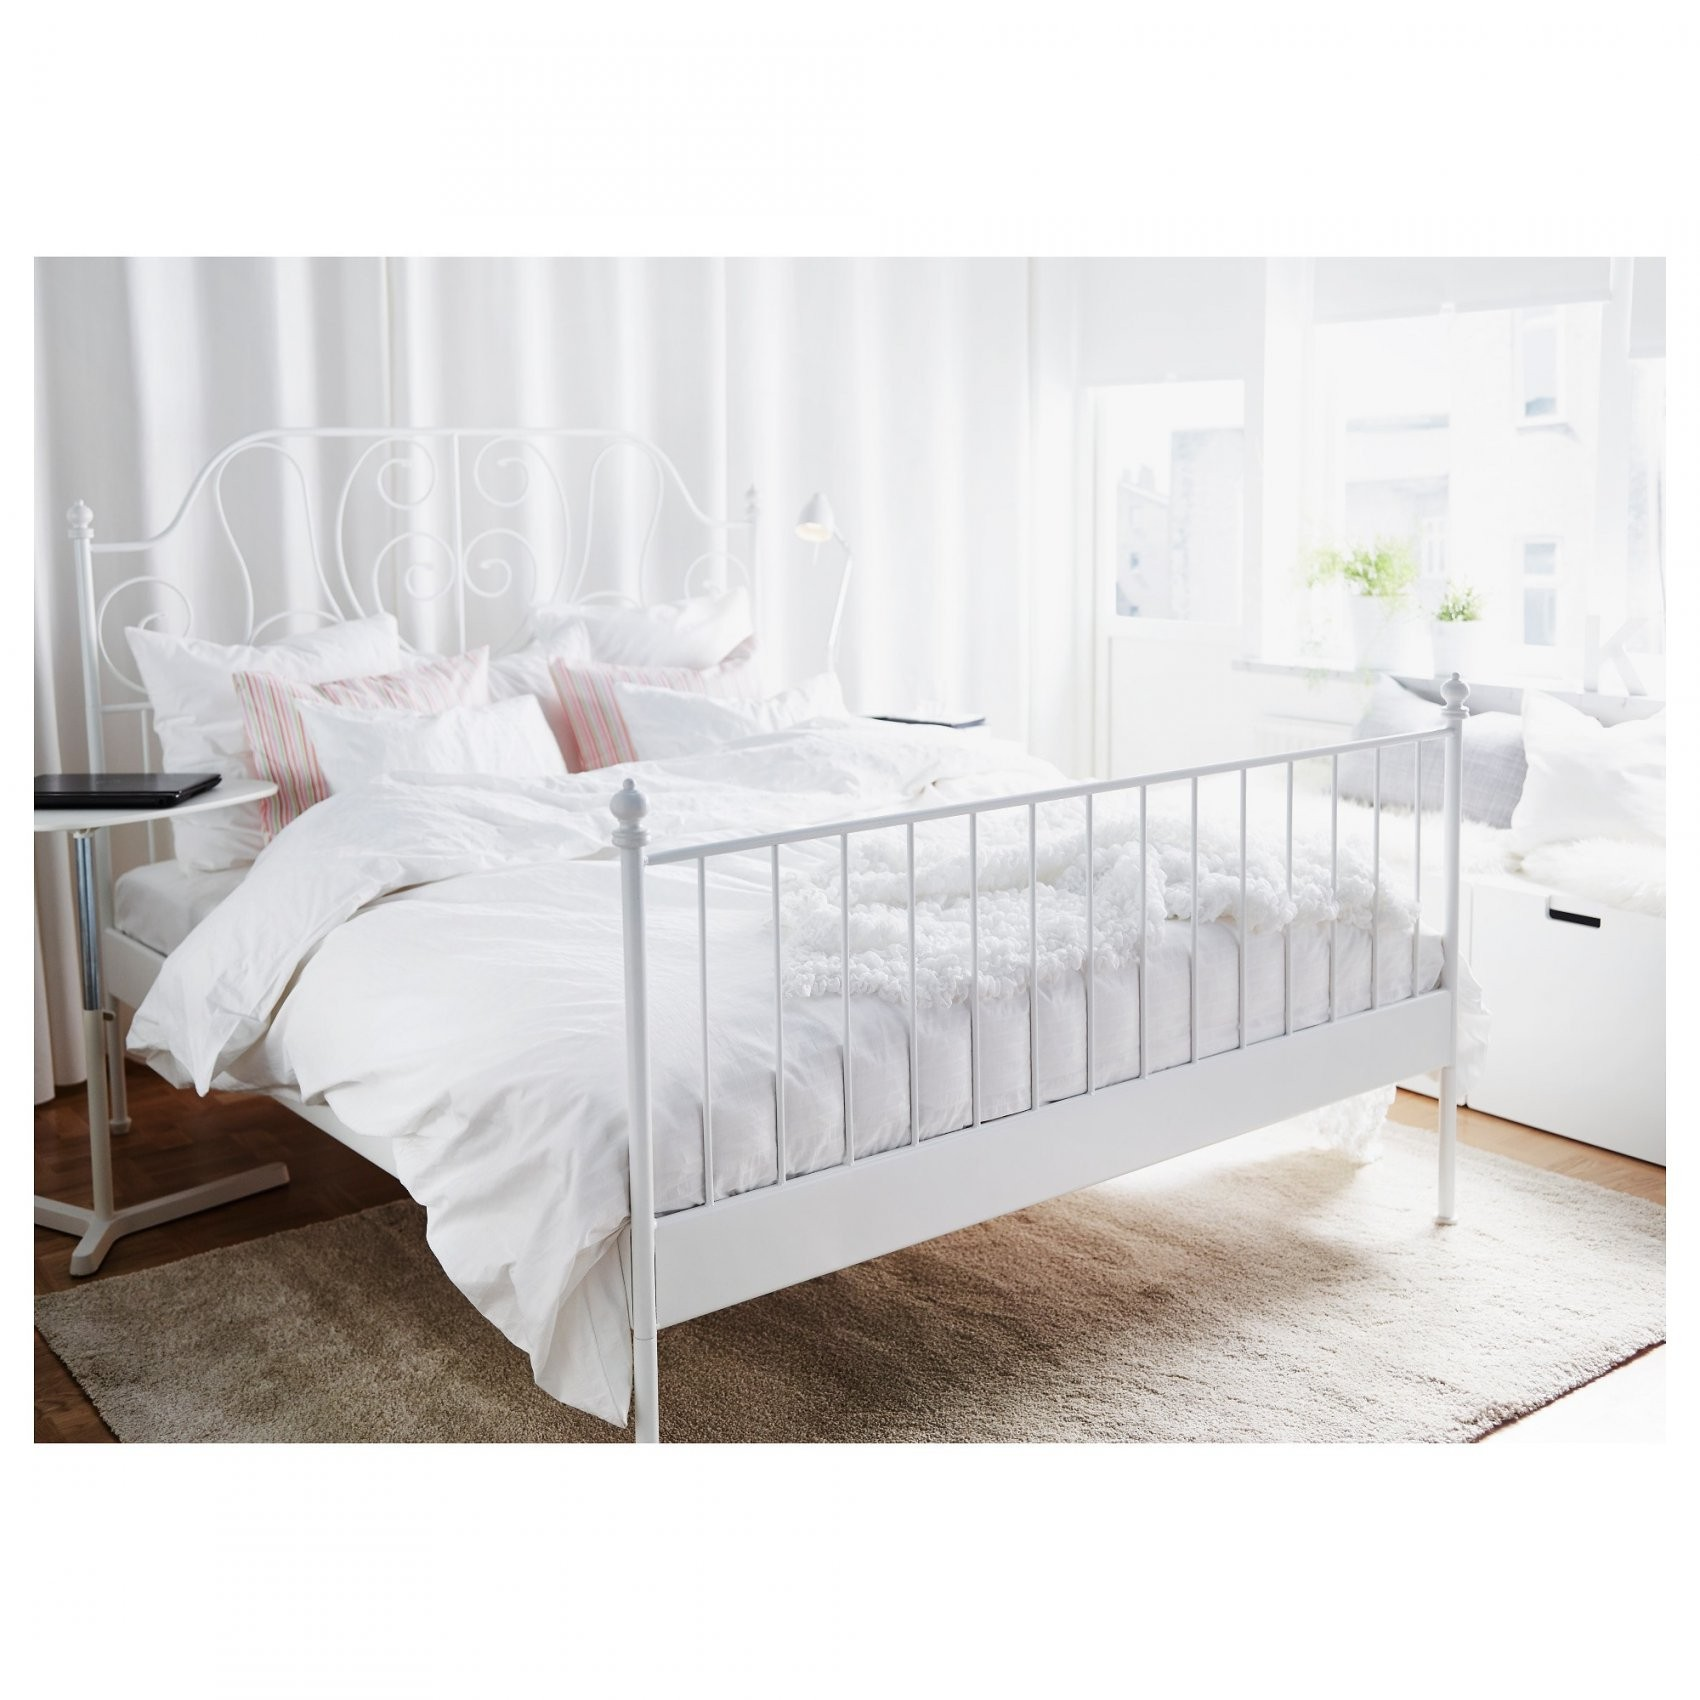 Leirvik Bedframe  160X200 Cm   Ikea von Ikea Bettgestell 160X200 Photo